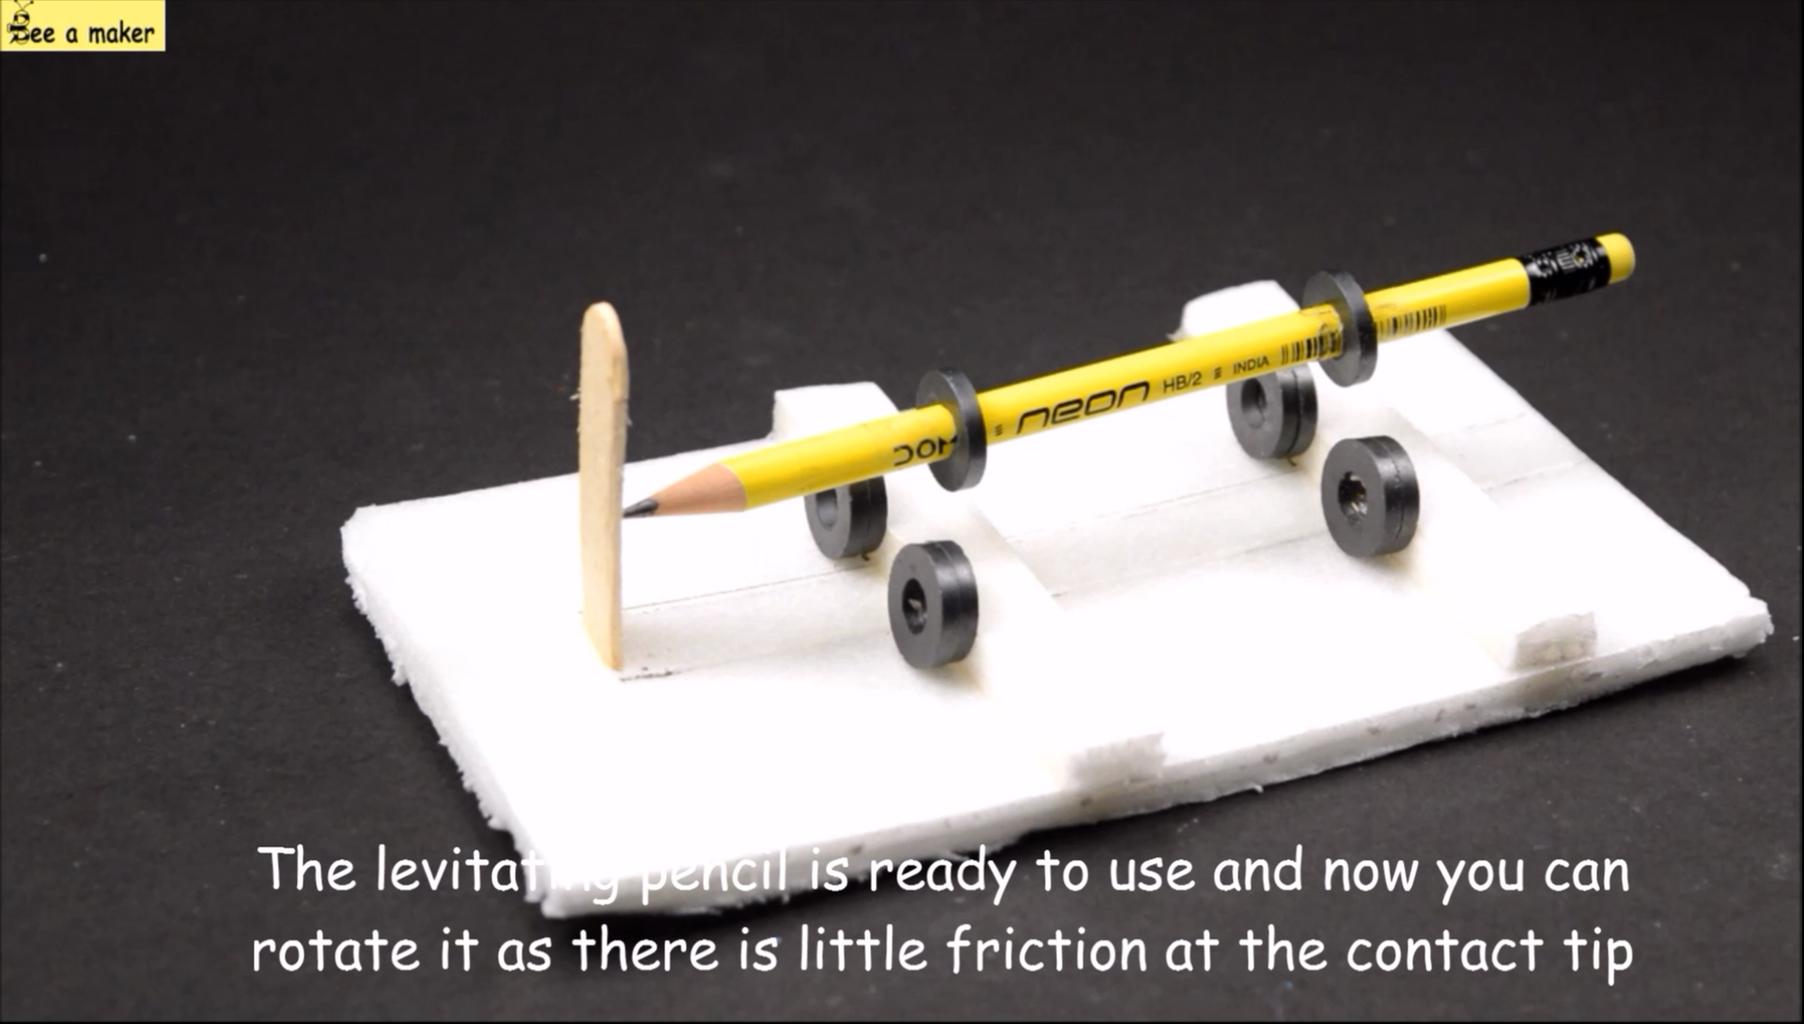 Levitating the Pencil